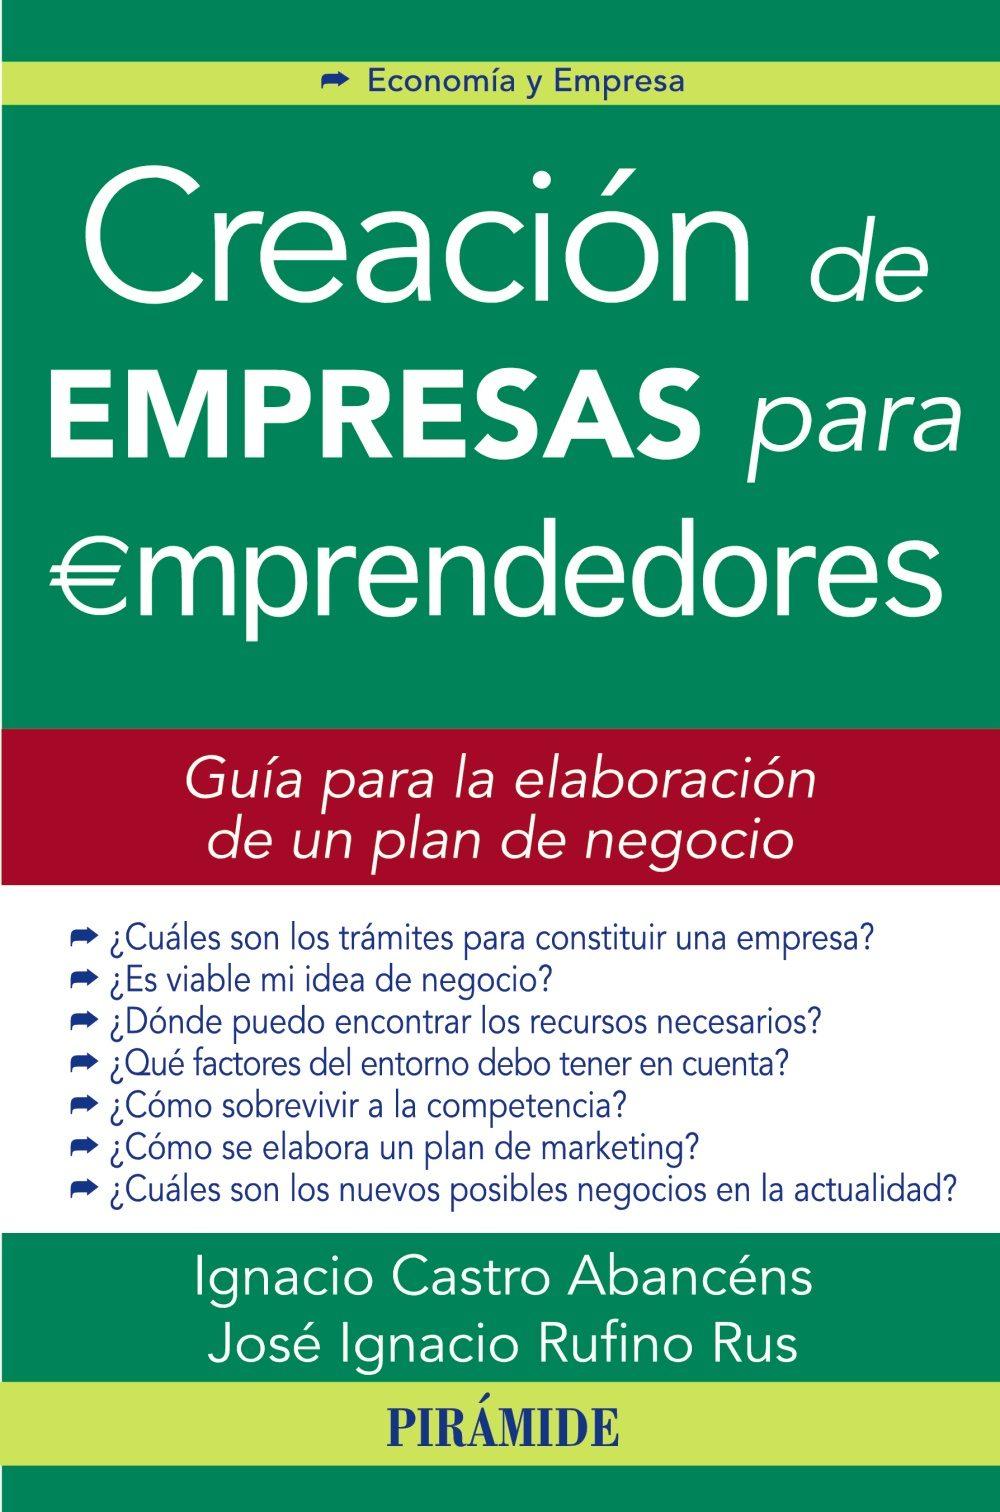 CREACION DE EMPRESAS PARA EMPRENDEDORES: GUIA PARA LA ELABORACION DE ...